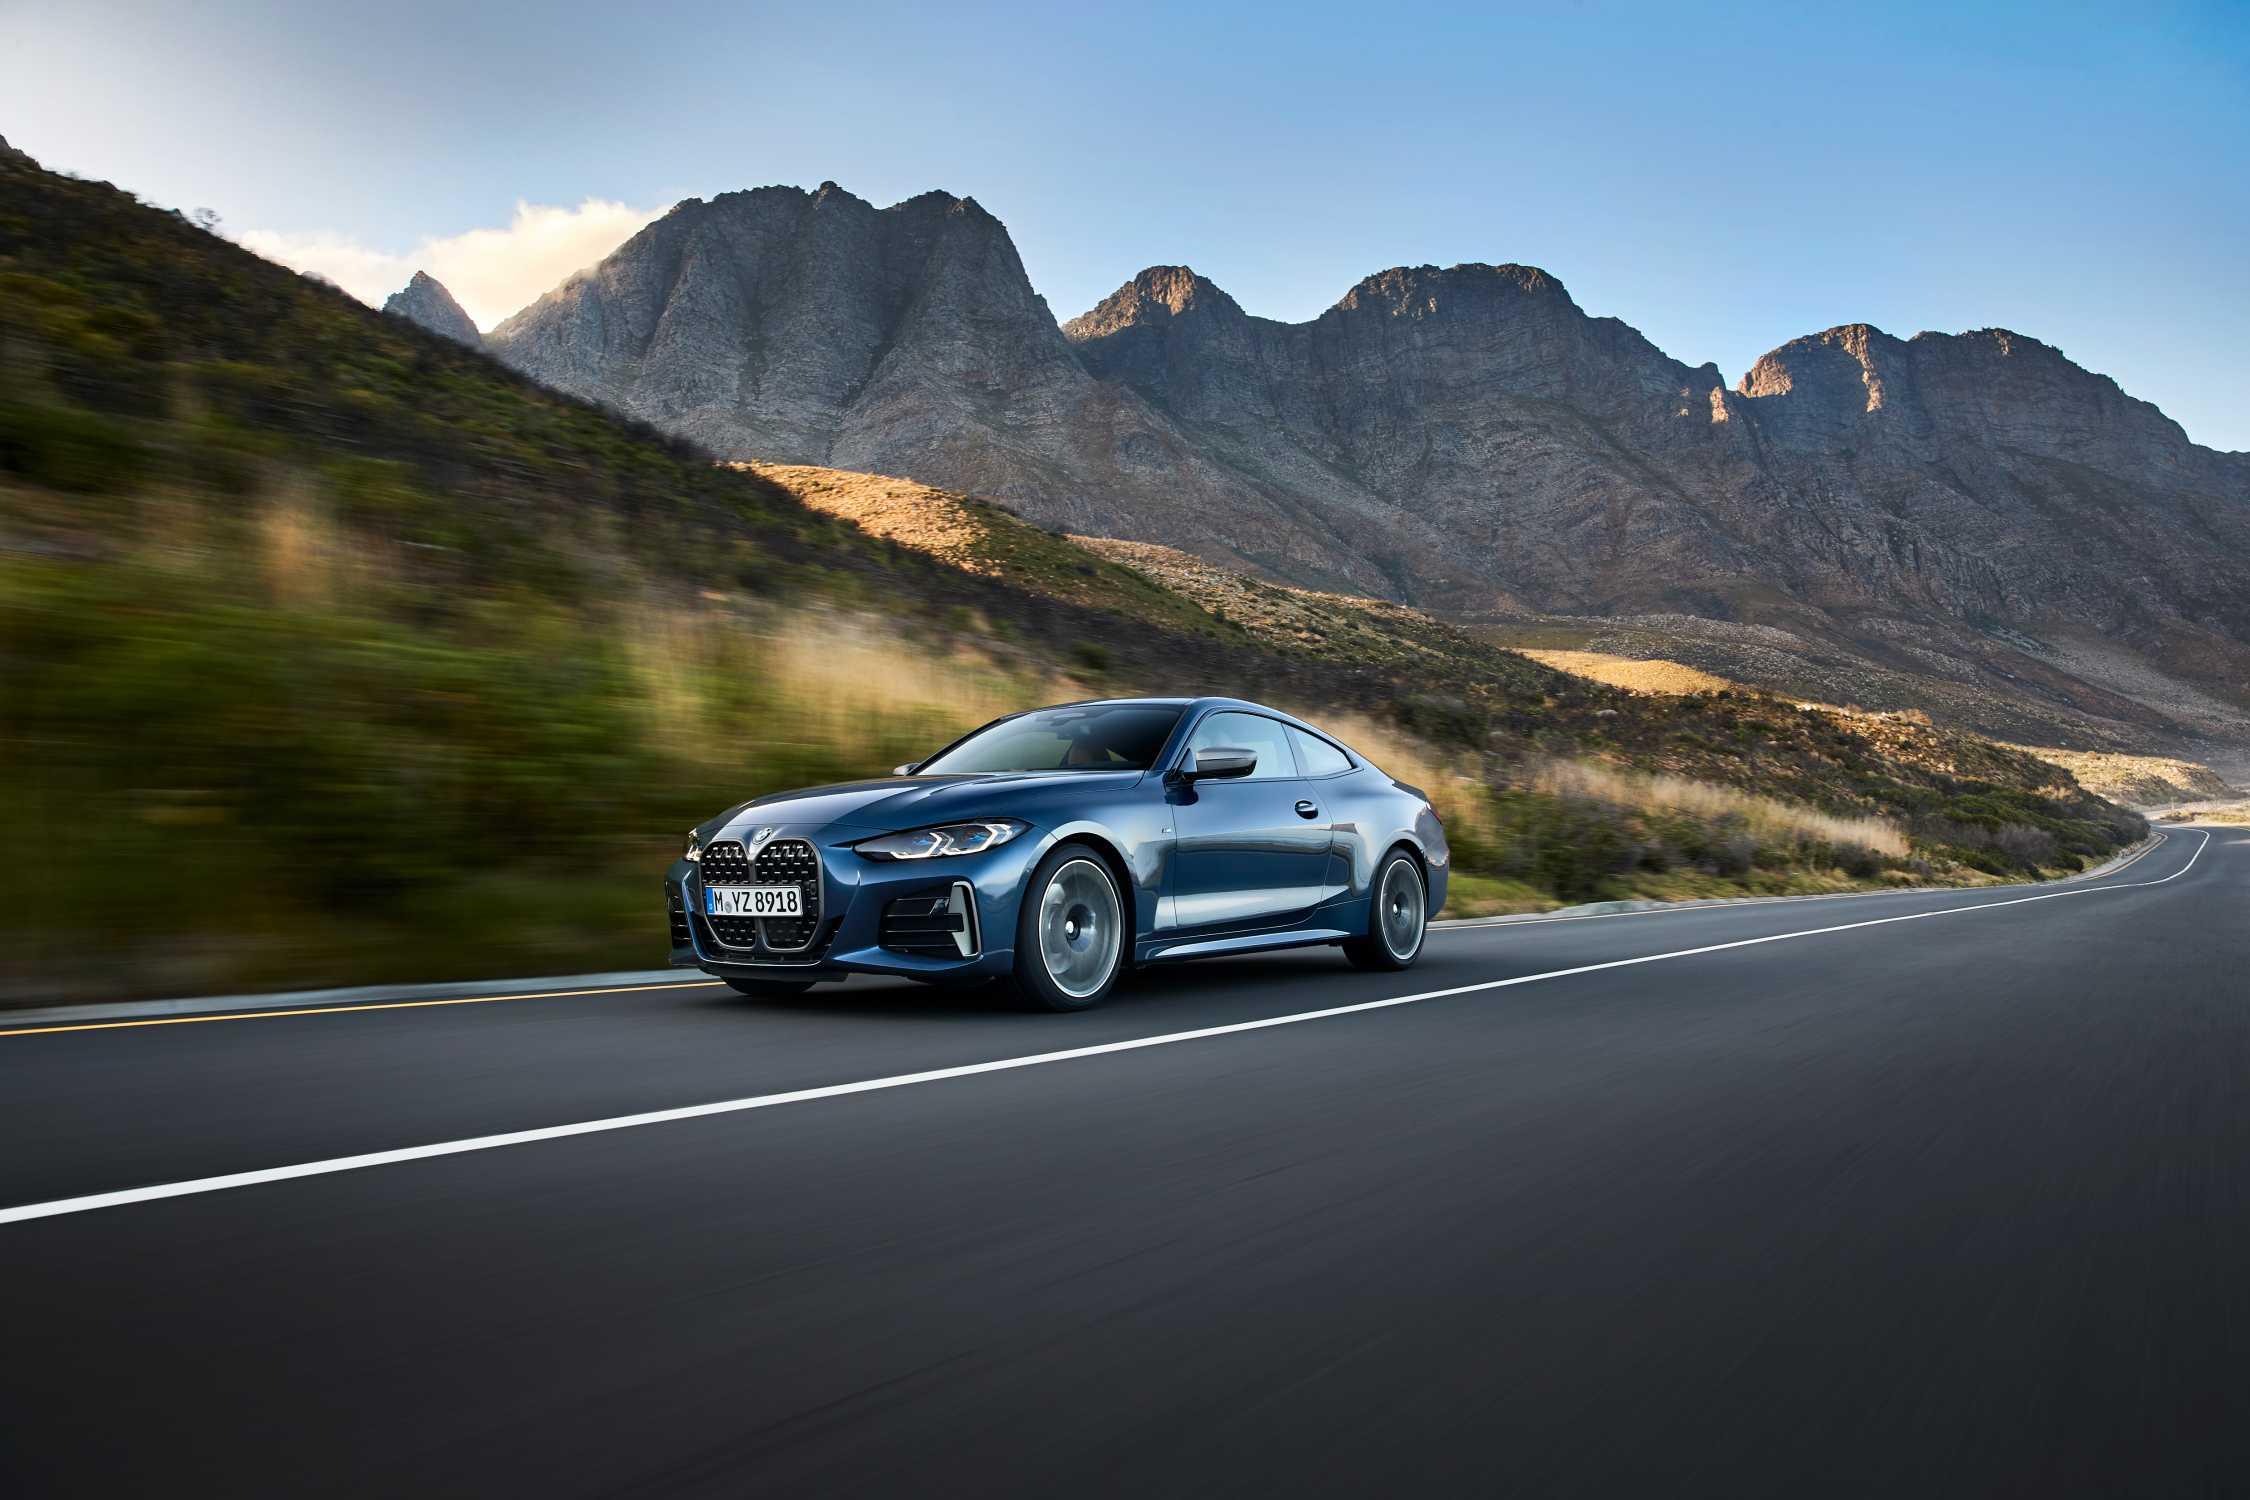 "BMW M440i xDrive, Arctic Race Blue, Rim 19"" Styling 797 M (06/2020)."